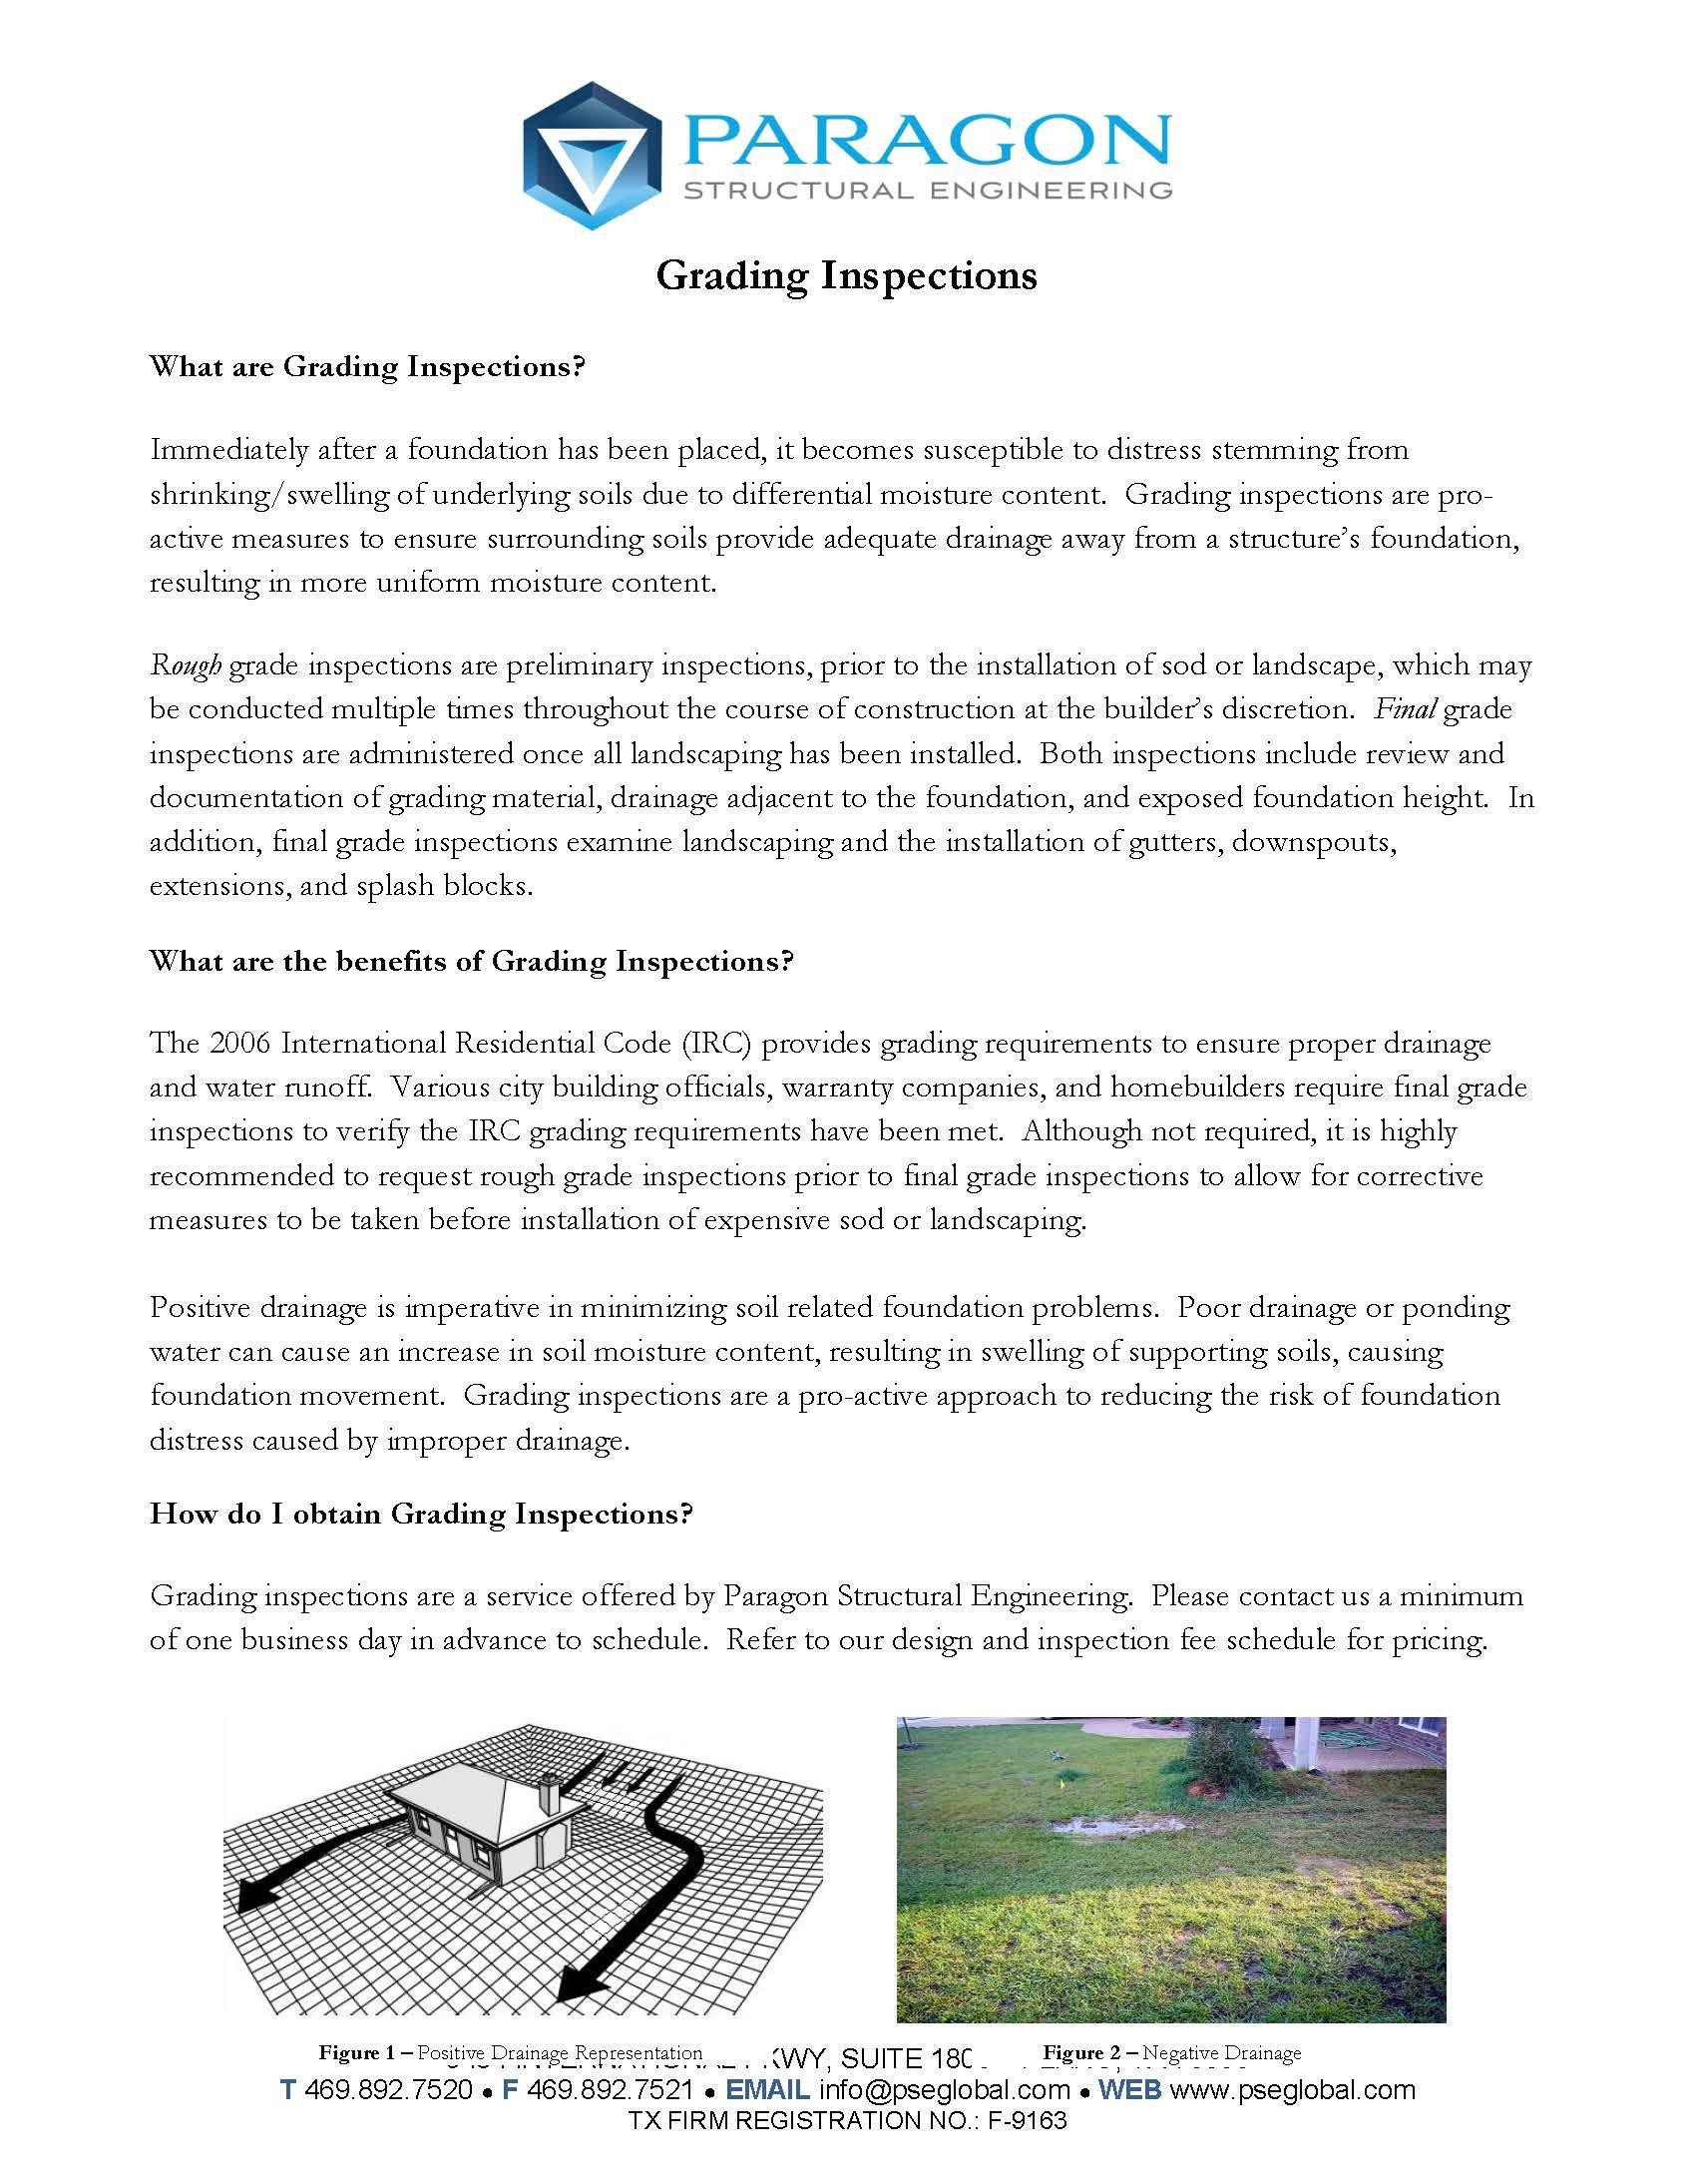 grading inspections brochure